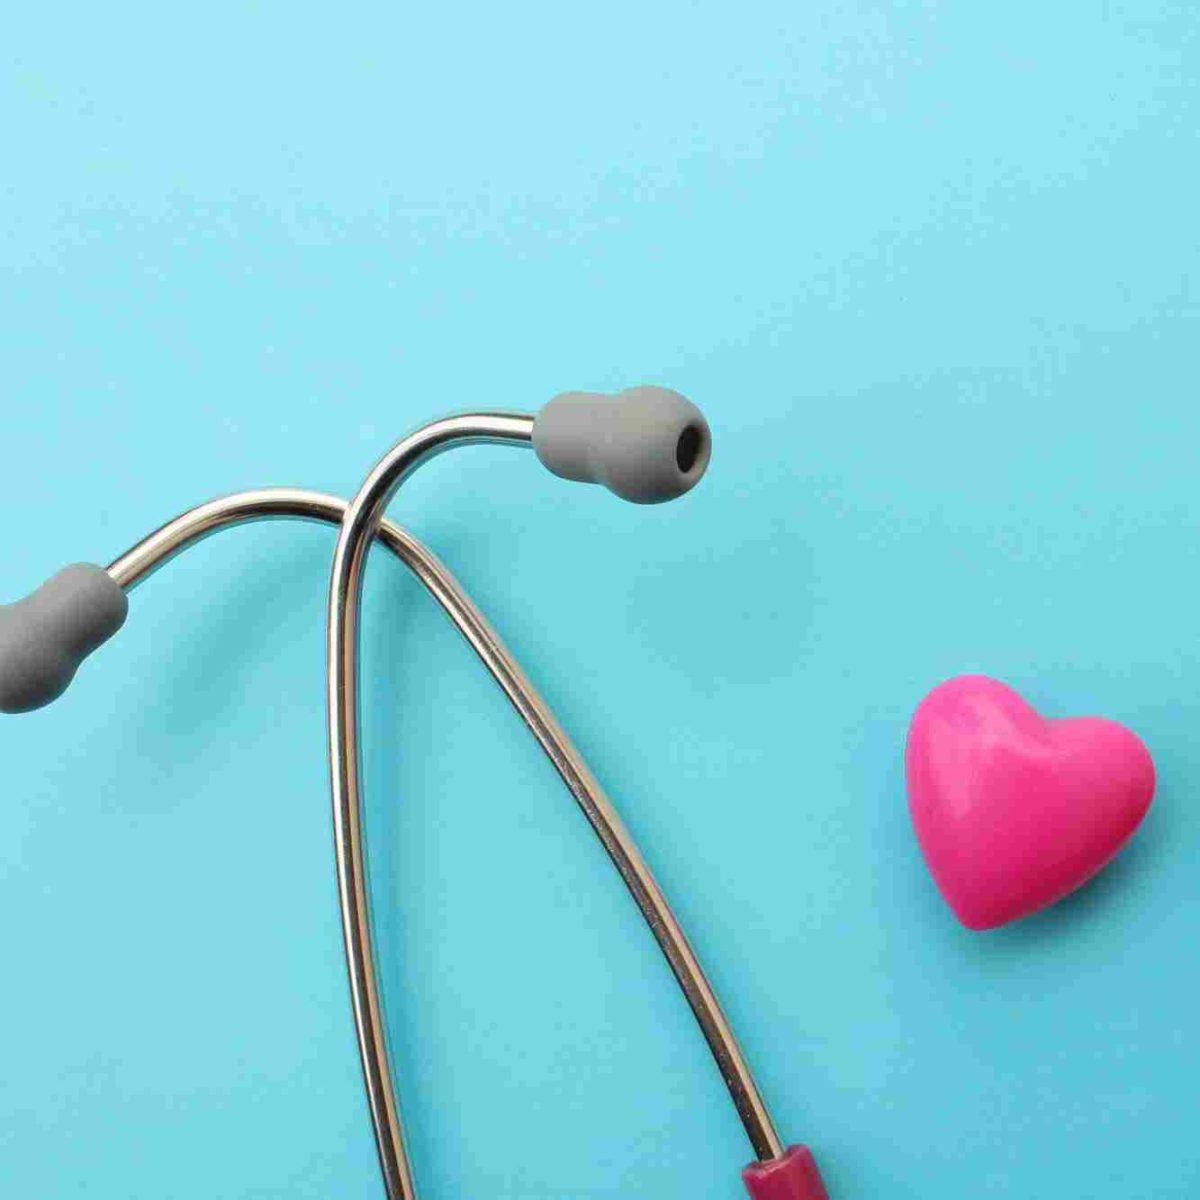 https://panmedik.com/wp-content/uploads/2015/12/srce-i-stetoskop-1200x1200.jpg